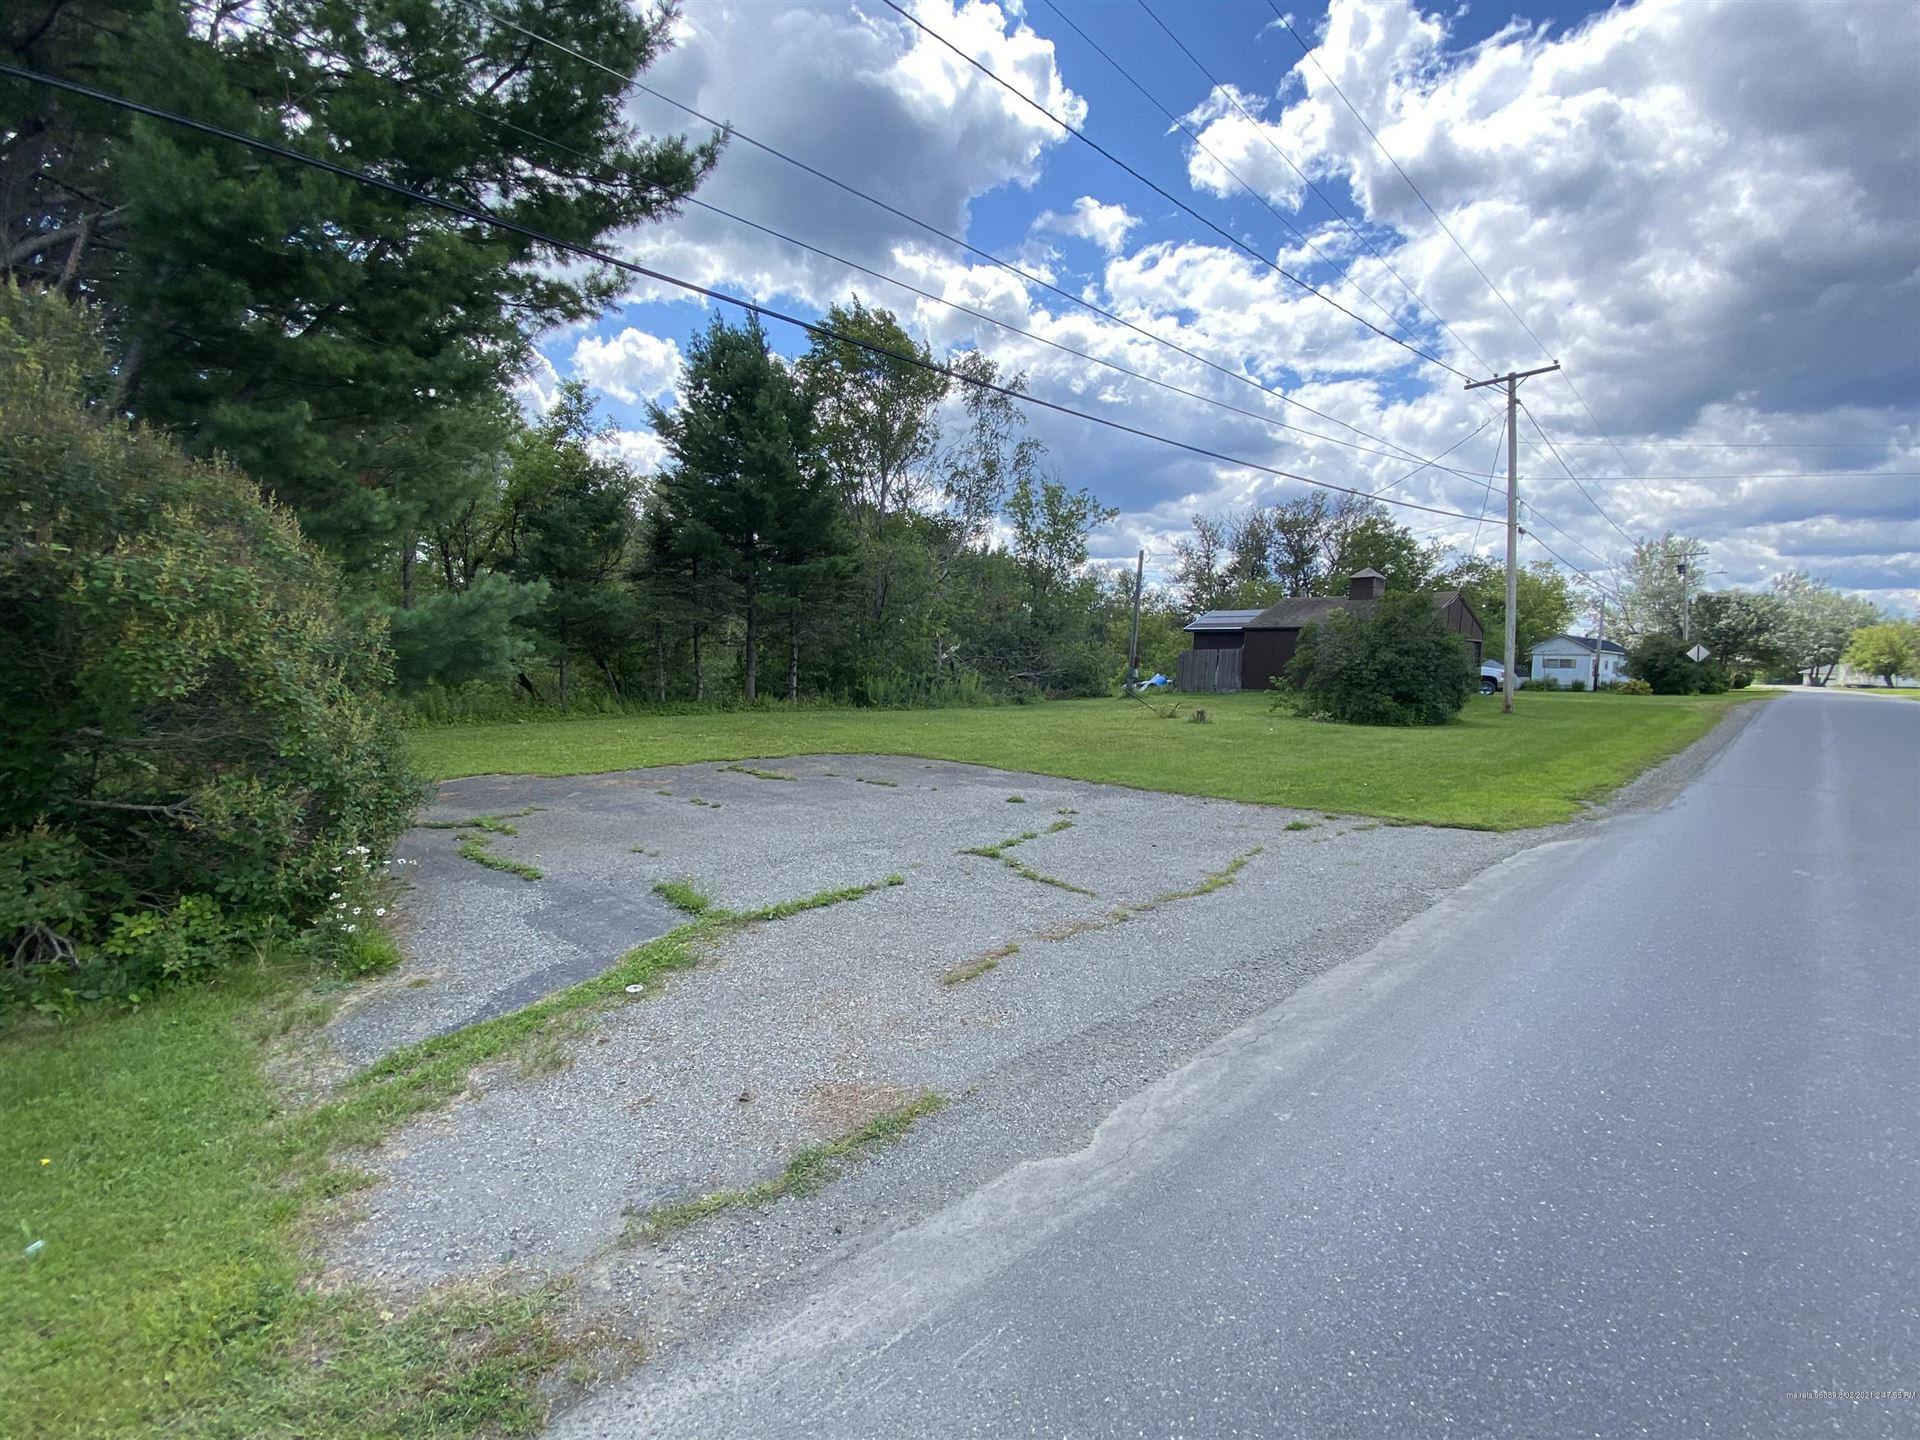 Photo of 37 Pulcifur Road, Mapleton, ME 04757 (MLS # 1503296)